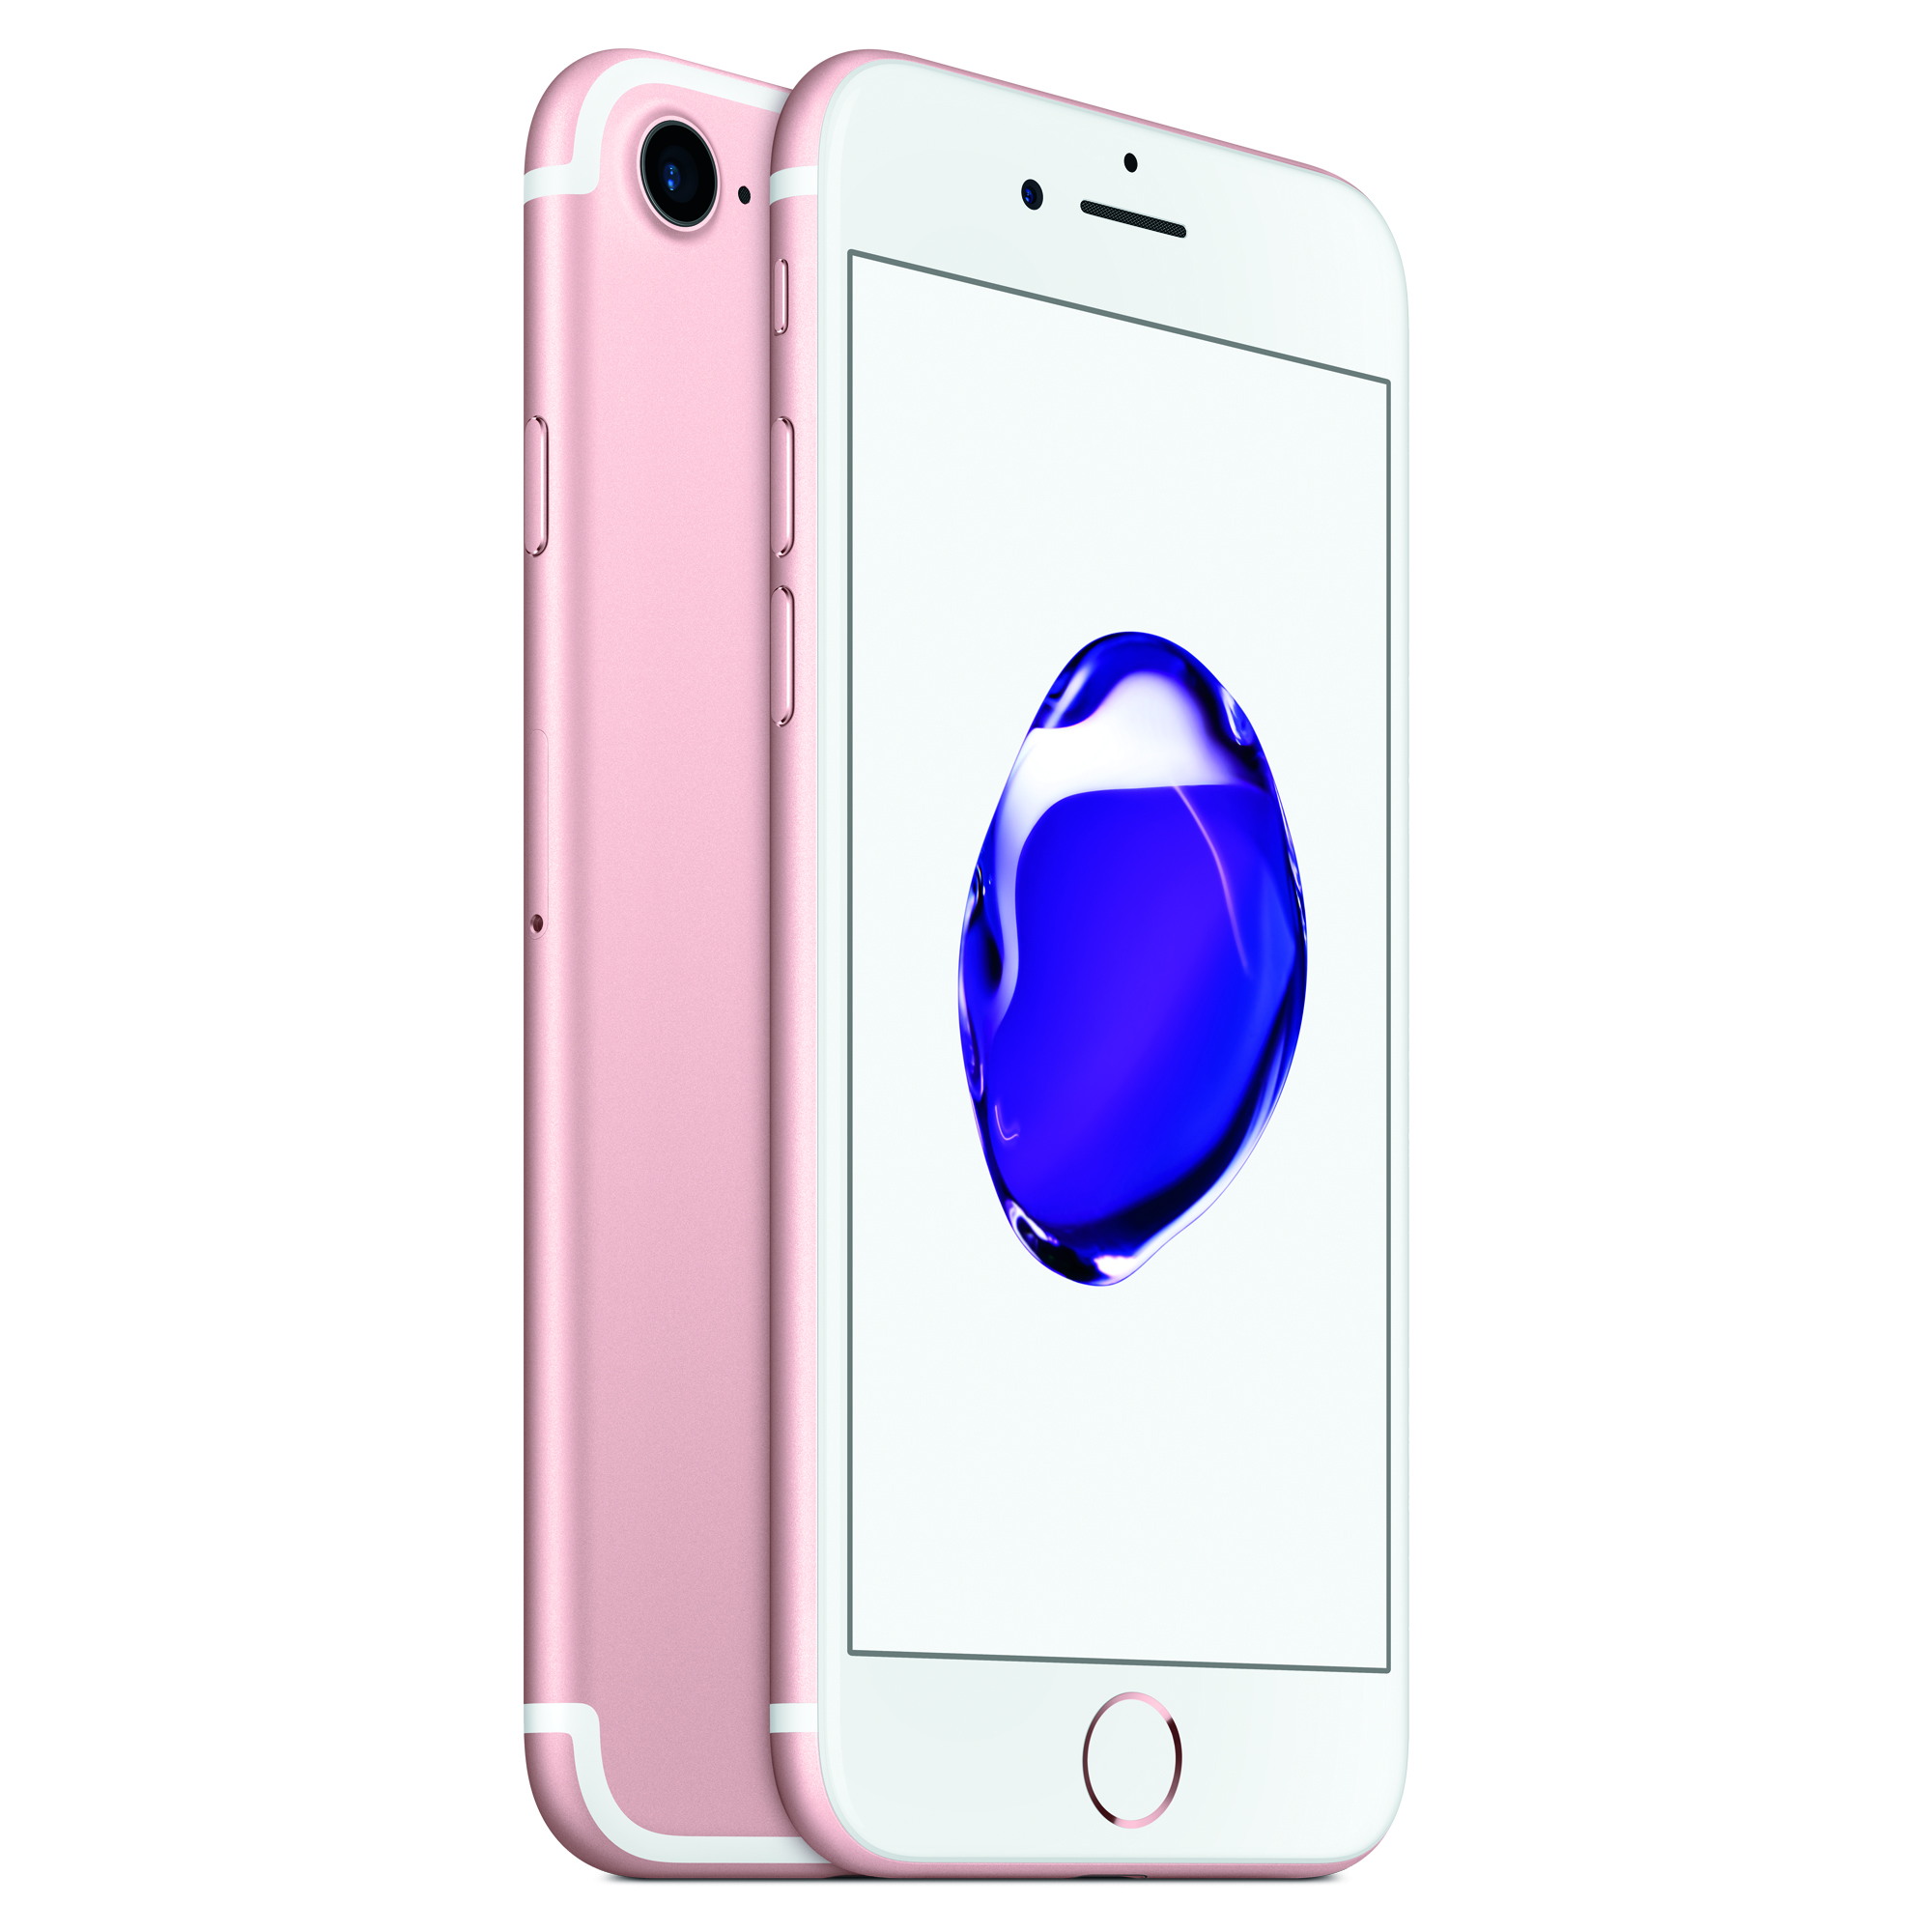 Walmart Family Mobile Apple iPhone 7 Prepaid